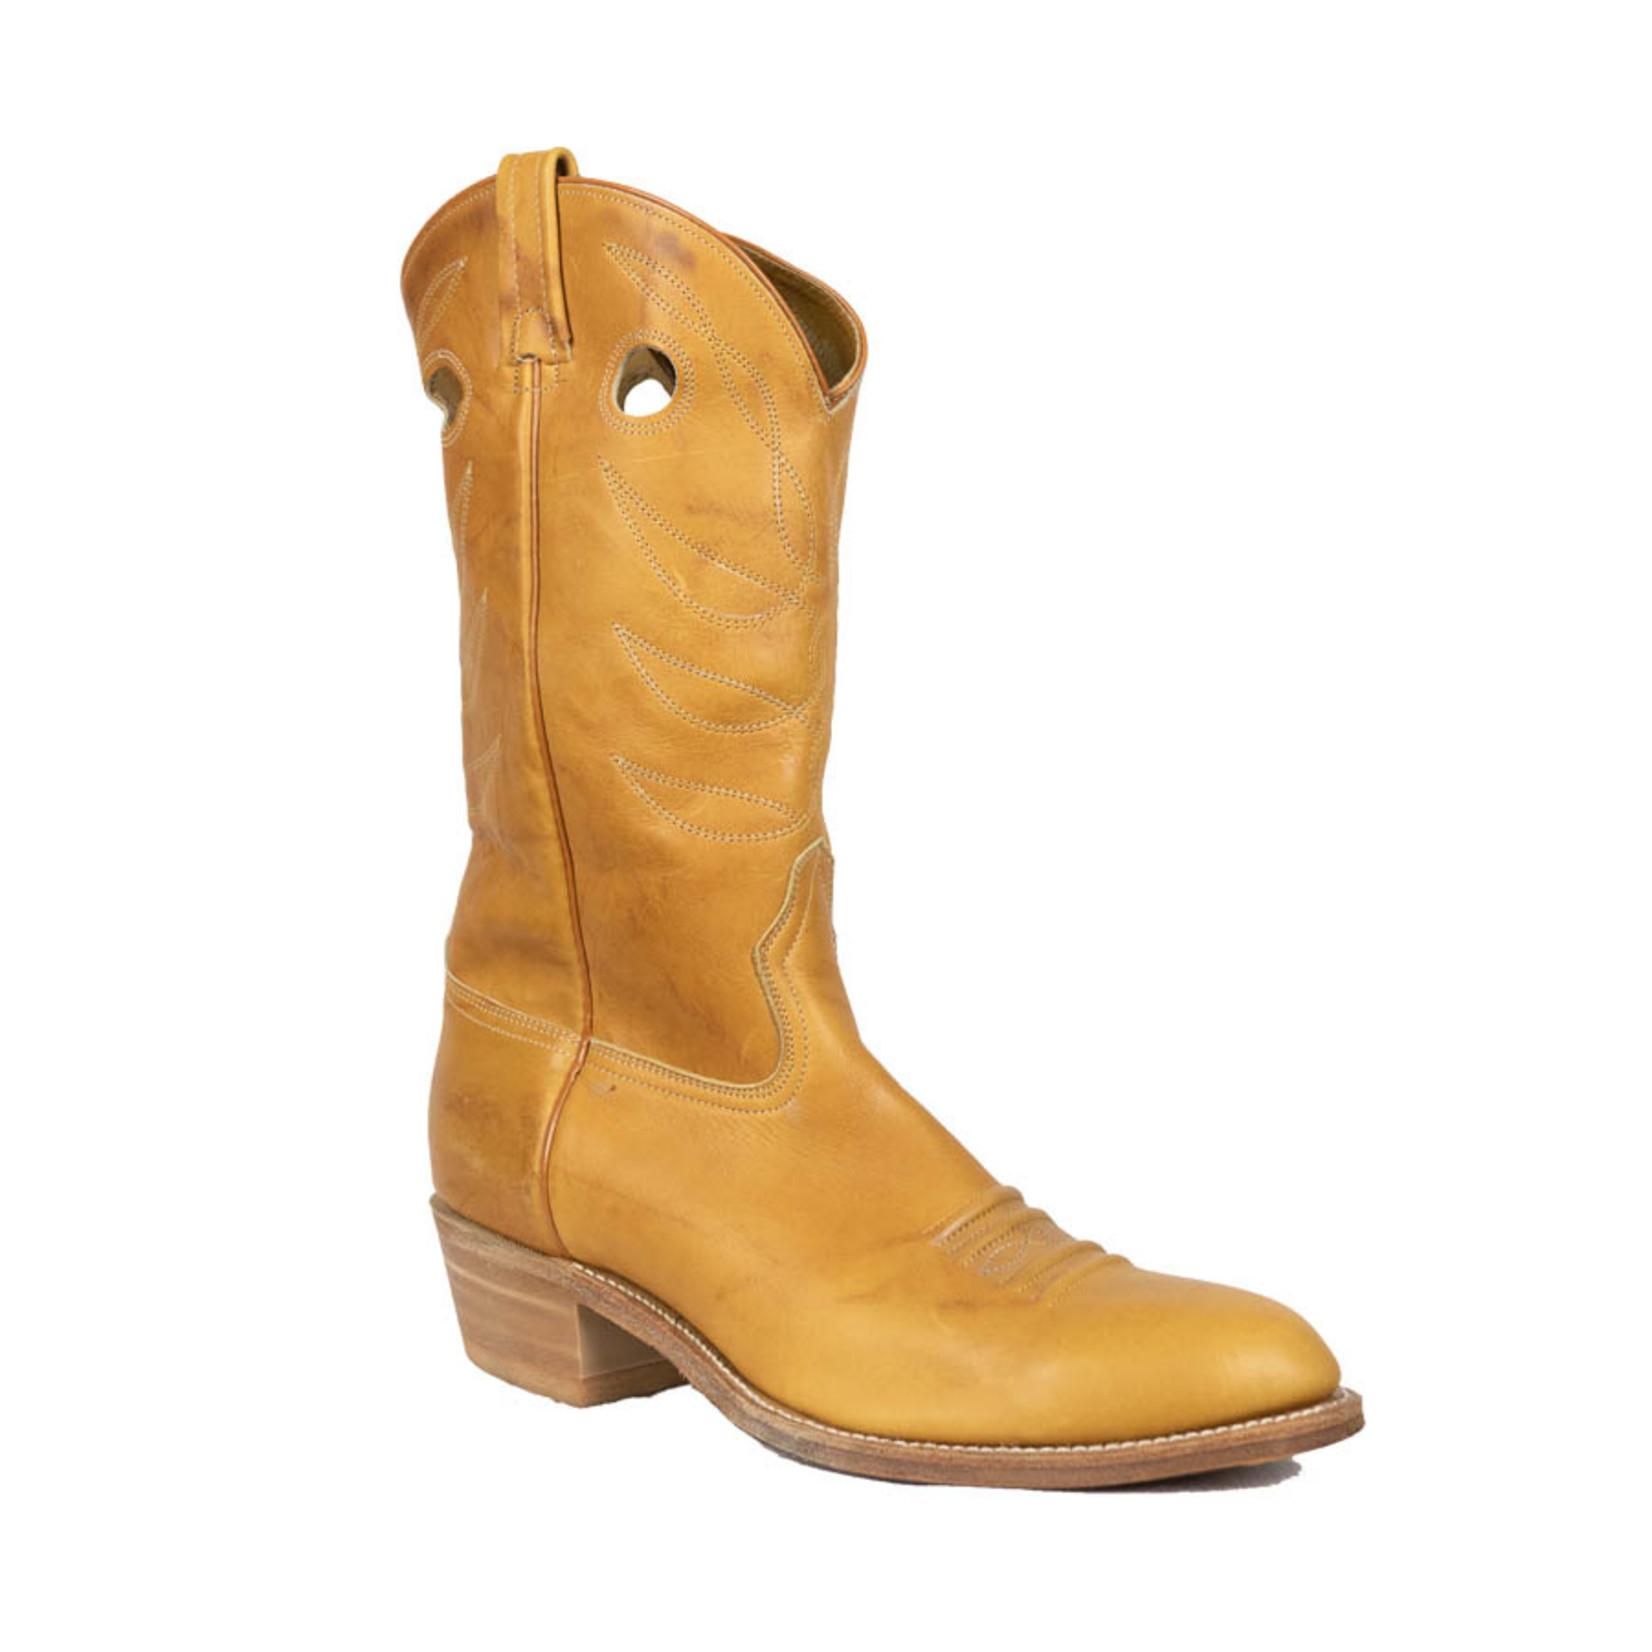 Canada West Acme Men's Cowboy Boot 6050 3E